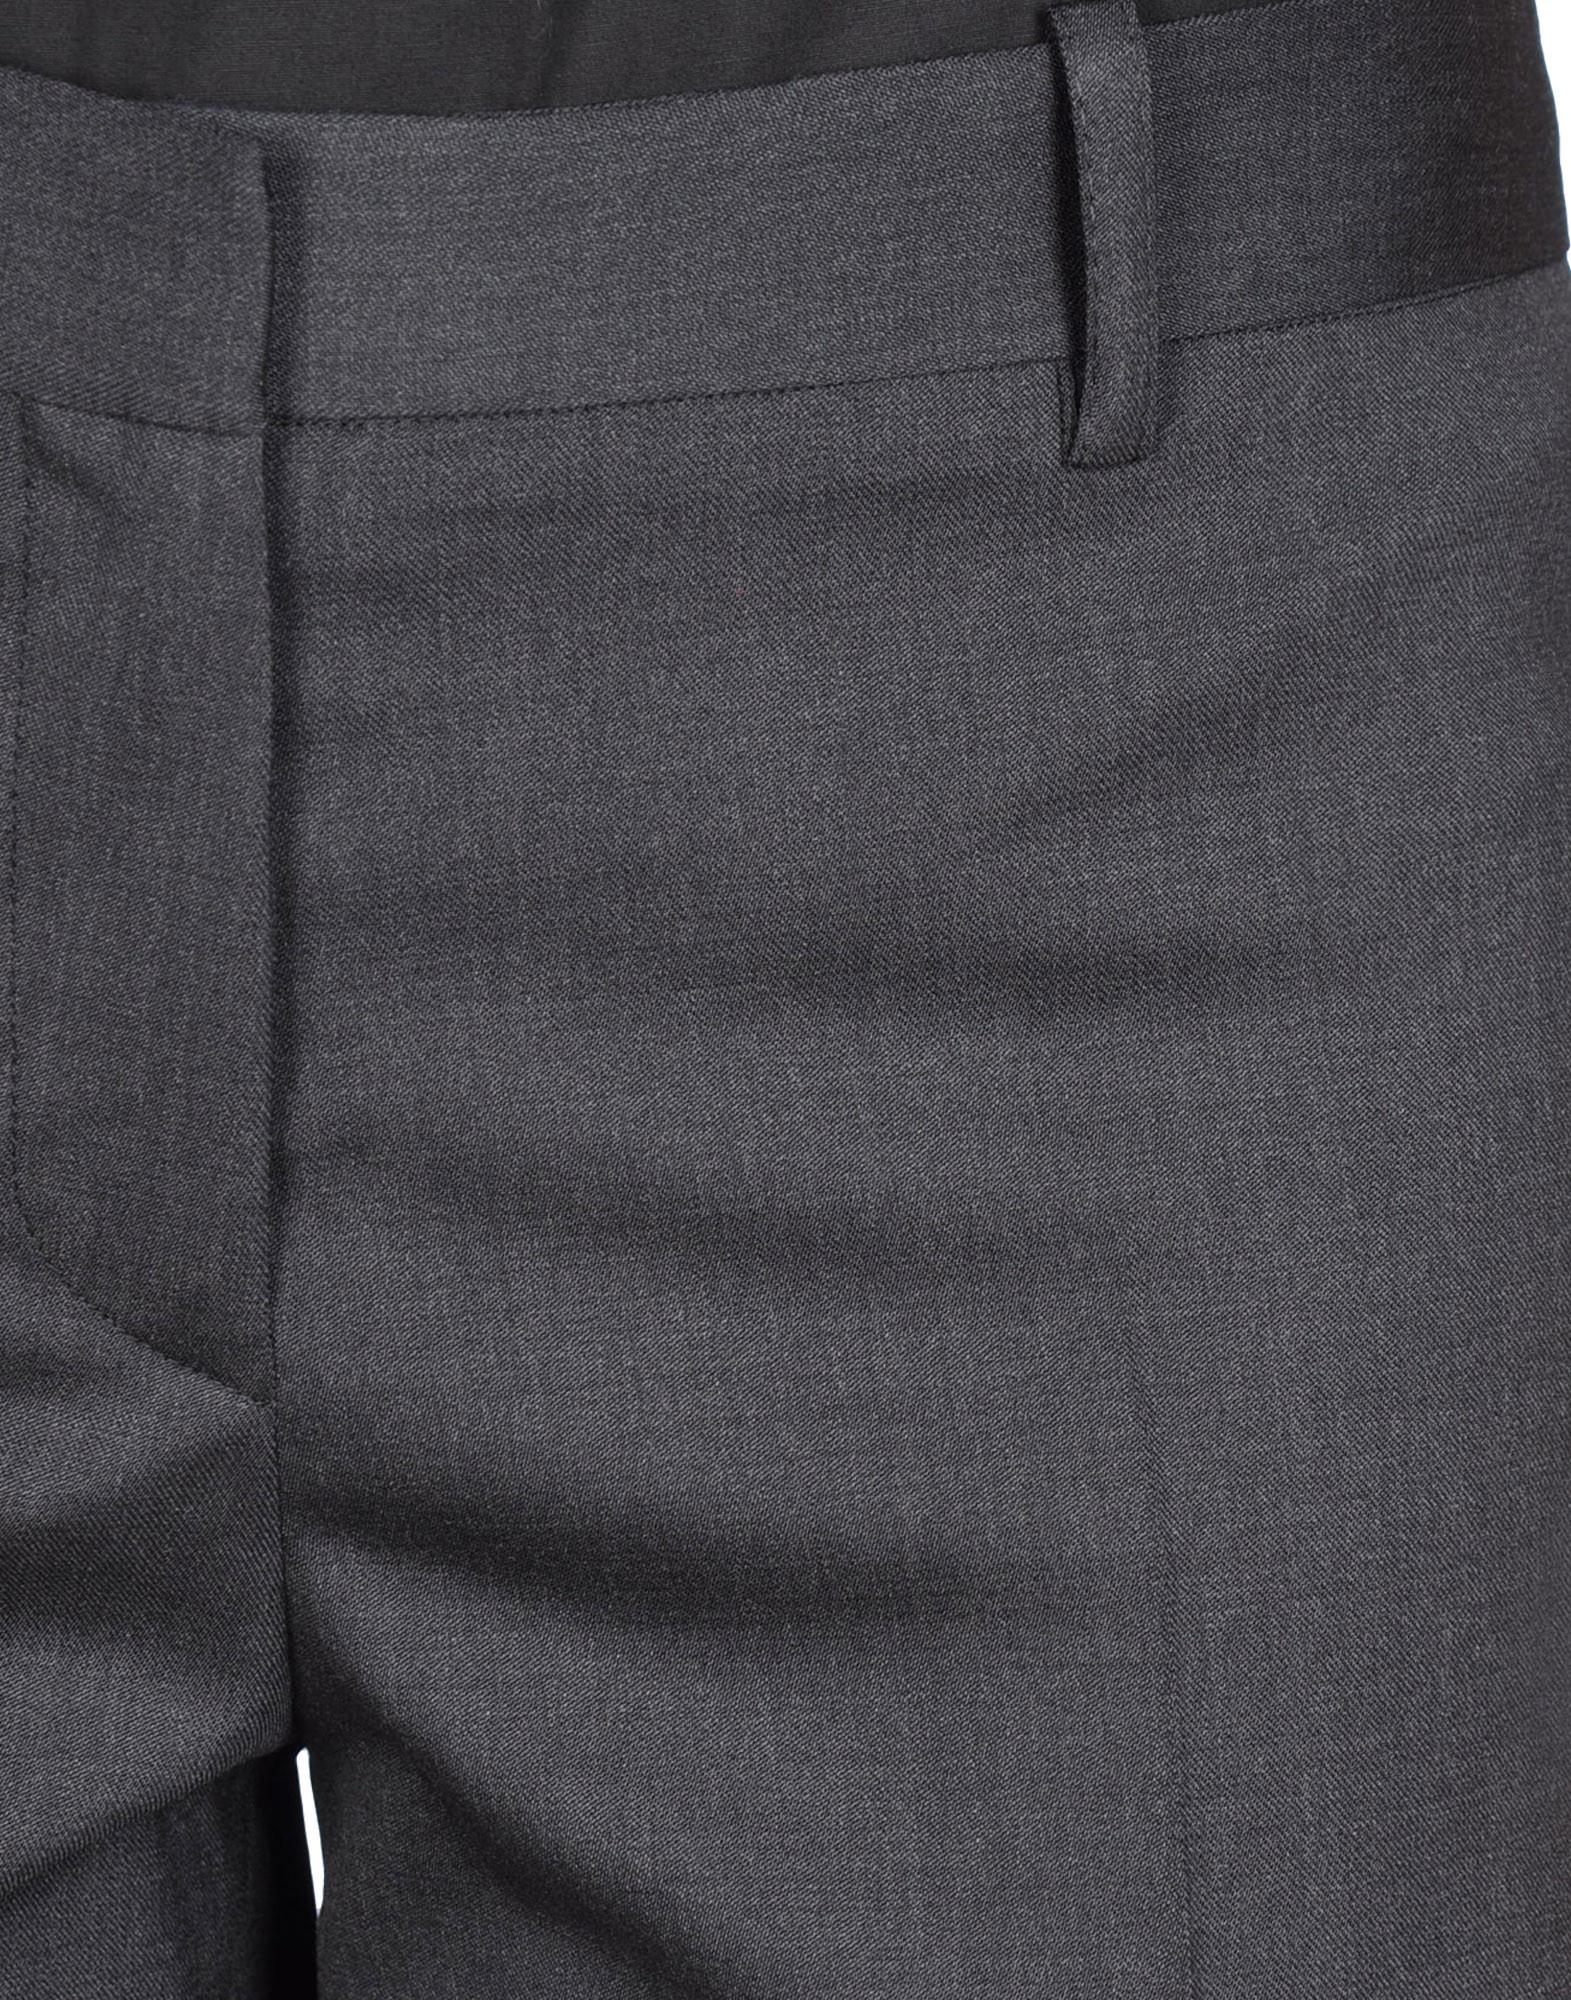 Bermuda shorts - JIL SANDER NAVY Online Store